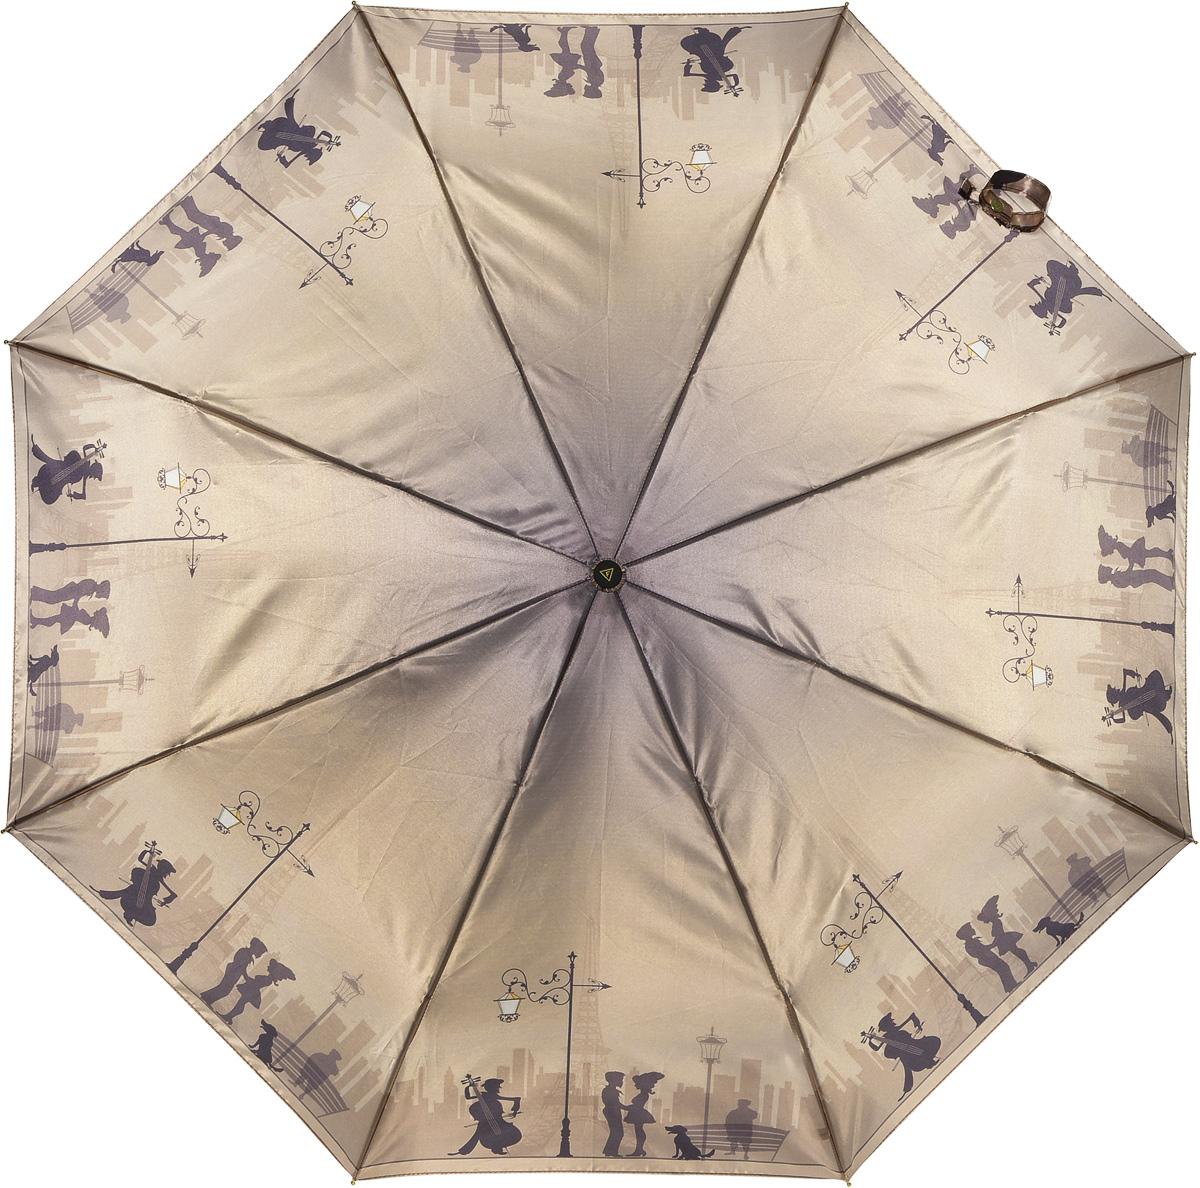 Зонт женский Fabretti, автомат, 3 сложения. L-16107-1L-16107-1Зонт женский Fabretti, облегченный суперавтомат, 3 сложения